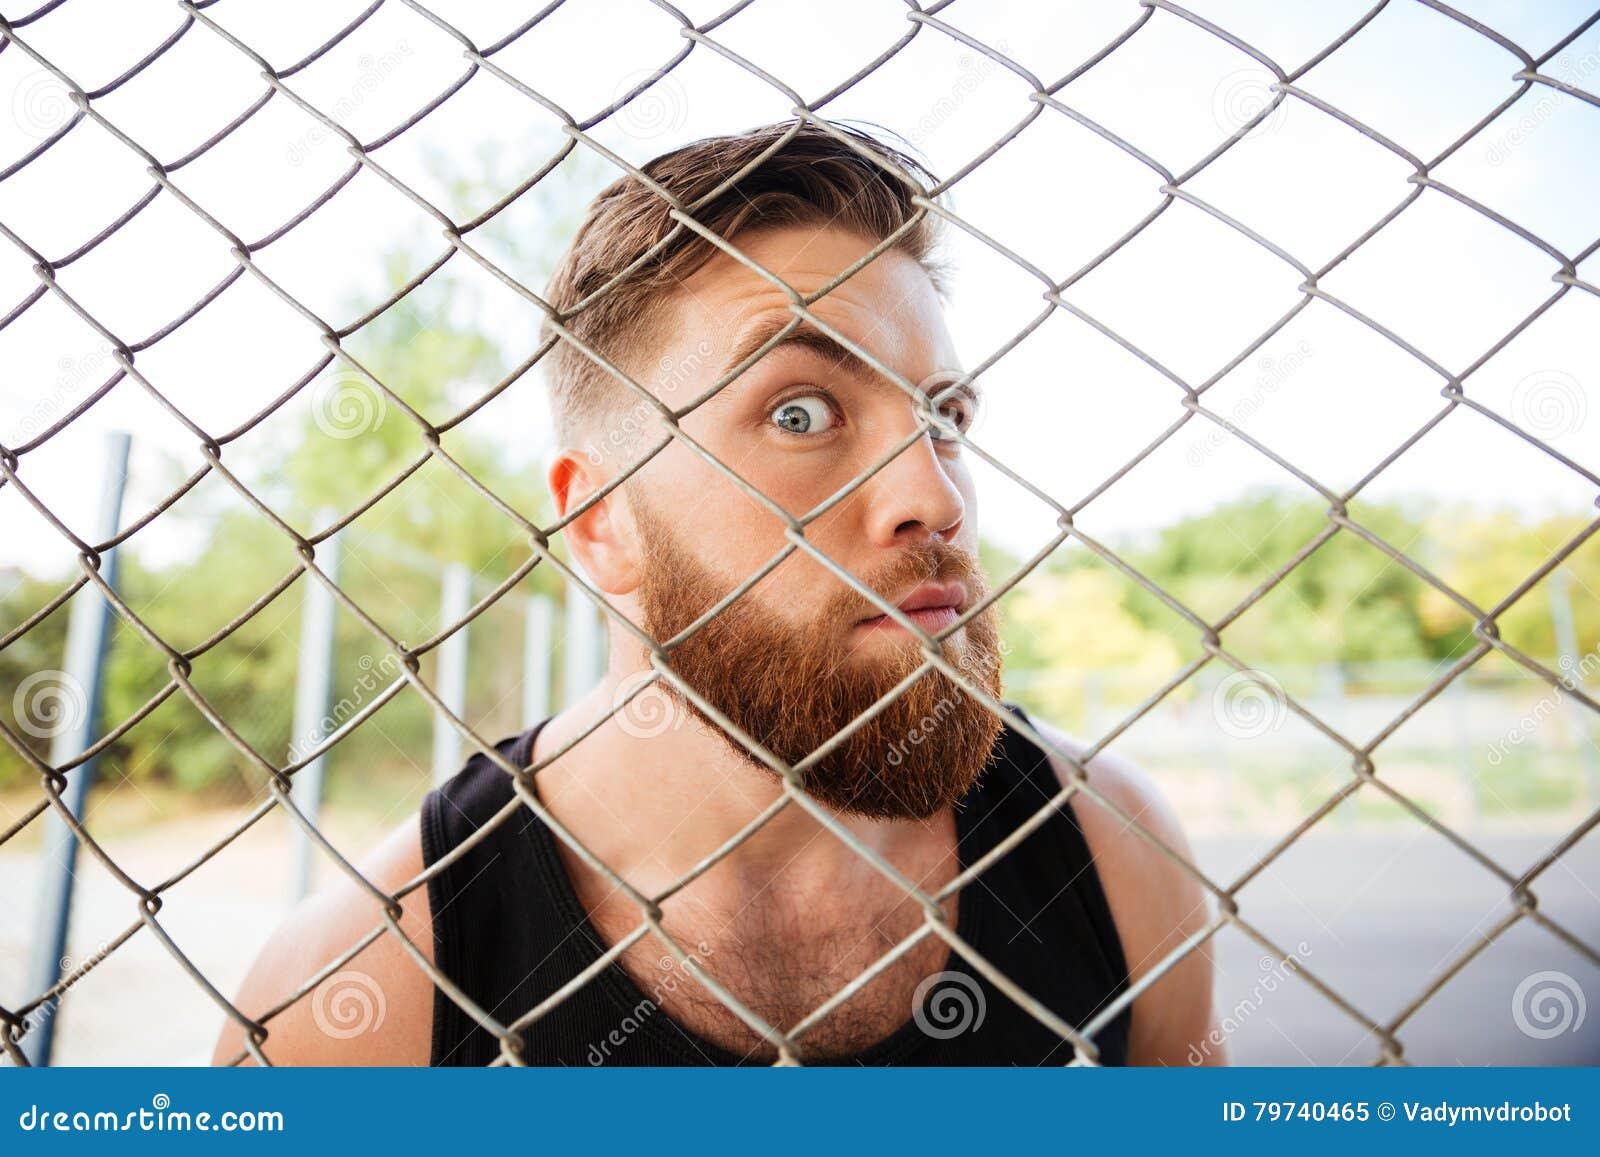 Retrato de un hombre divertido que mira a través de la cerca del metal